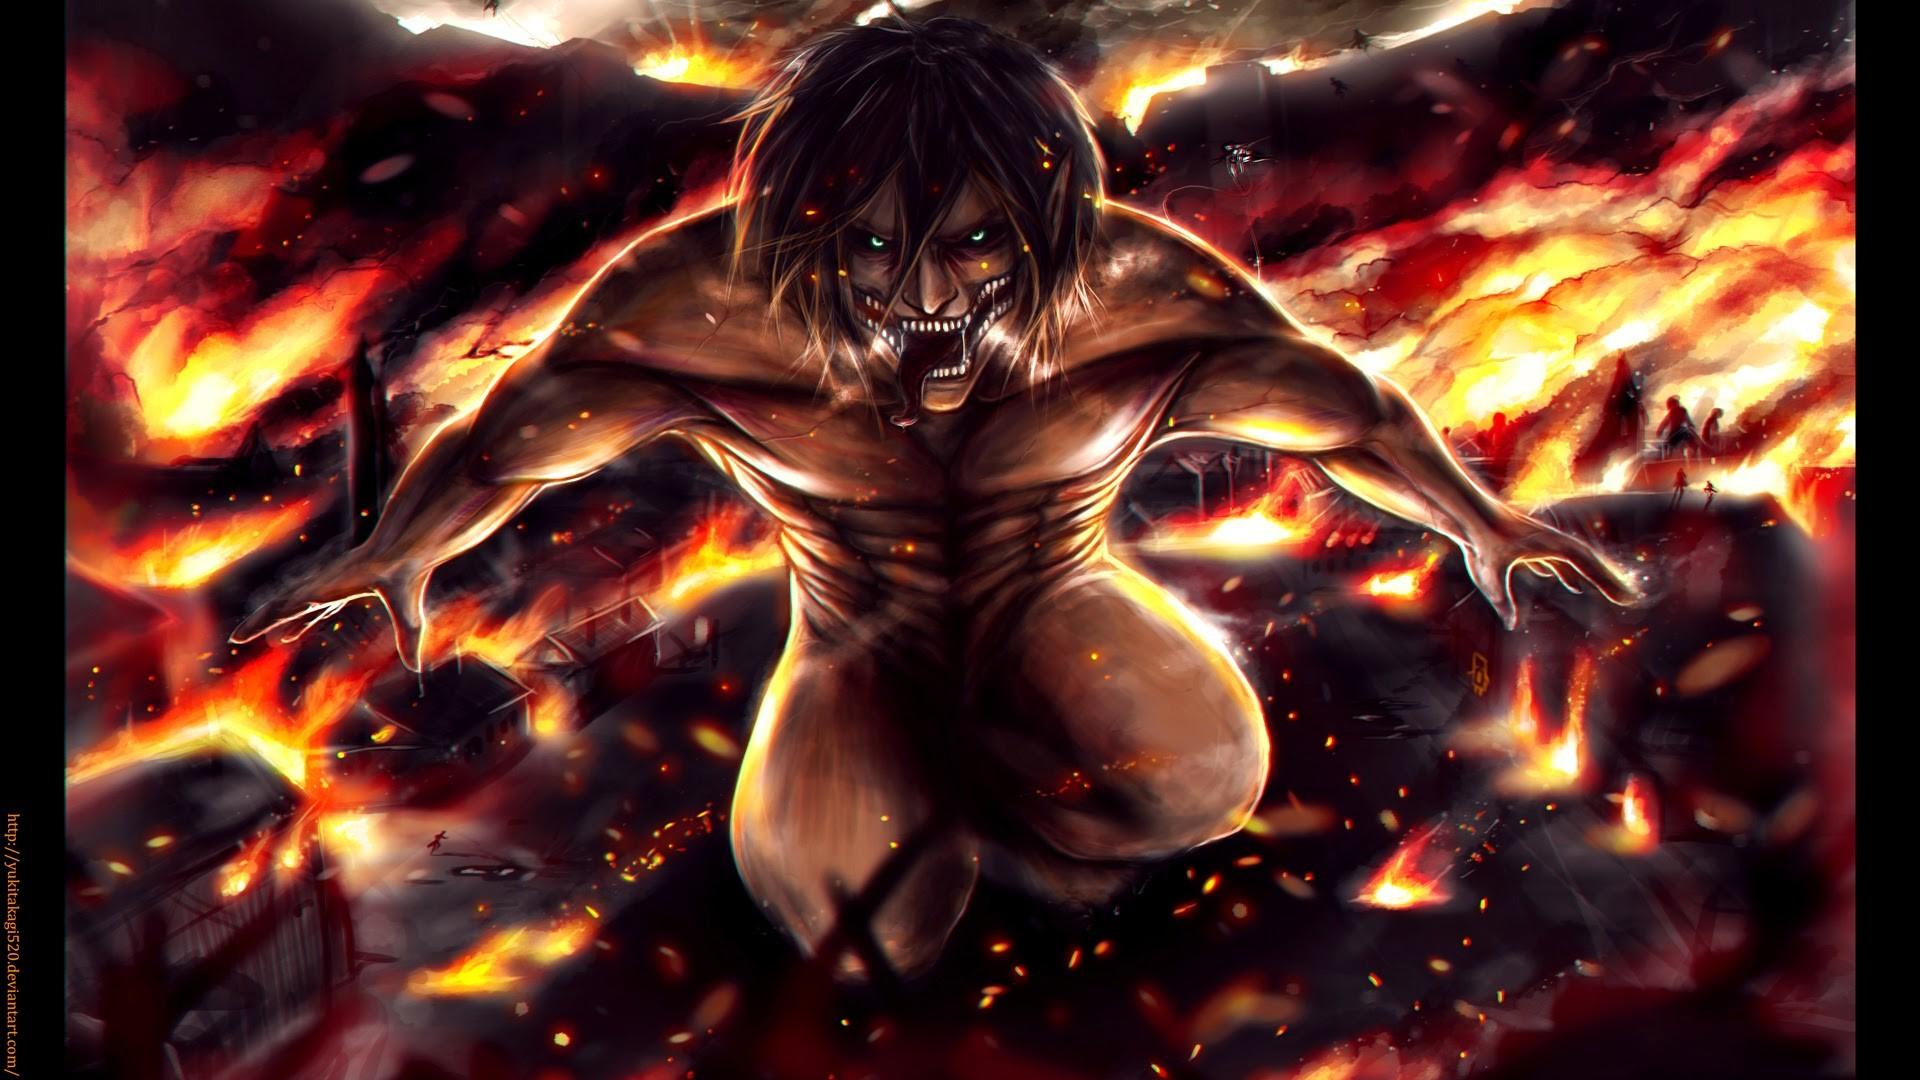 Attack On Titan Eren Wallpaper 1080p Eren yeager jaeger rogue titan